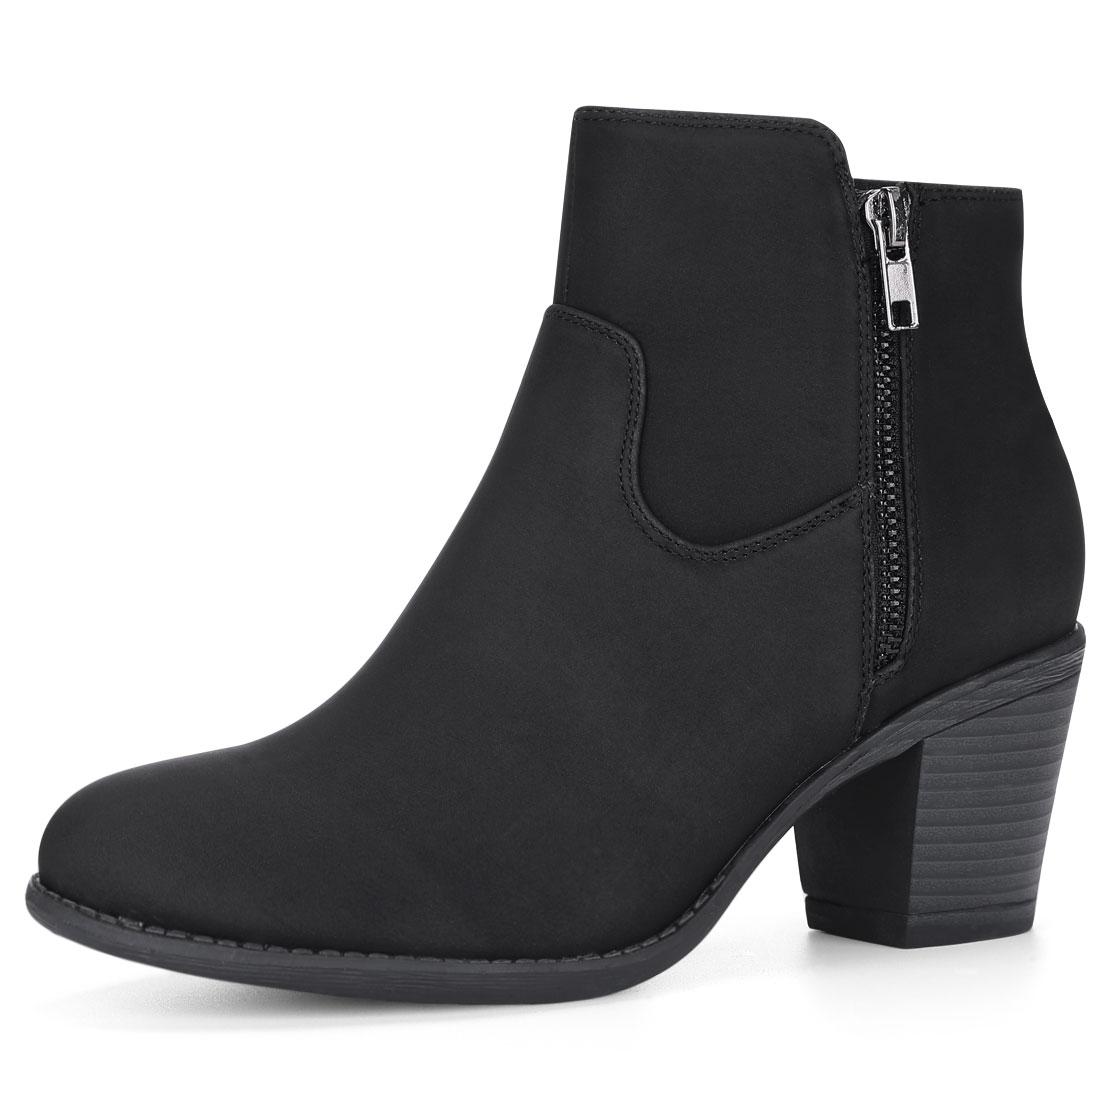 Allegra K Women Round Toe Stacked Chunky Heel Zipper Ankle Boots Black US 7